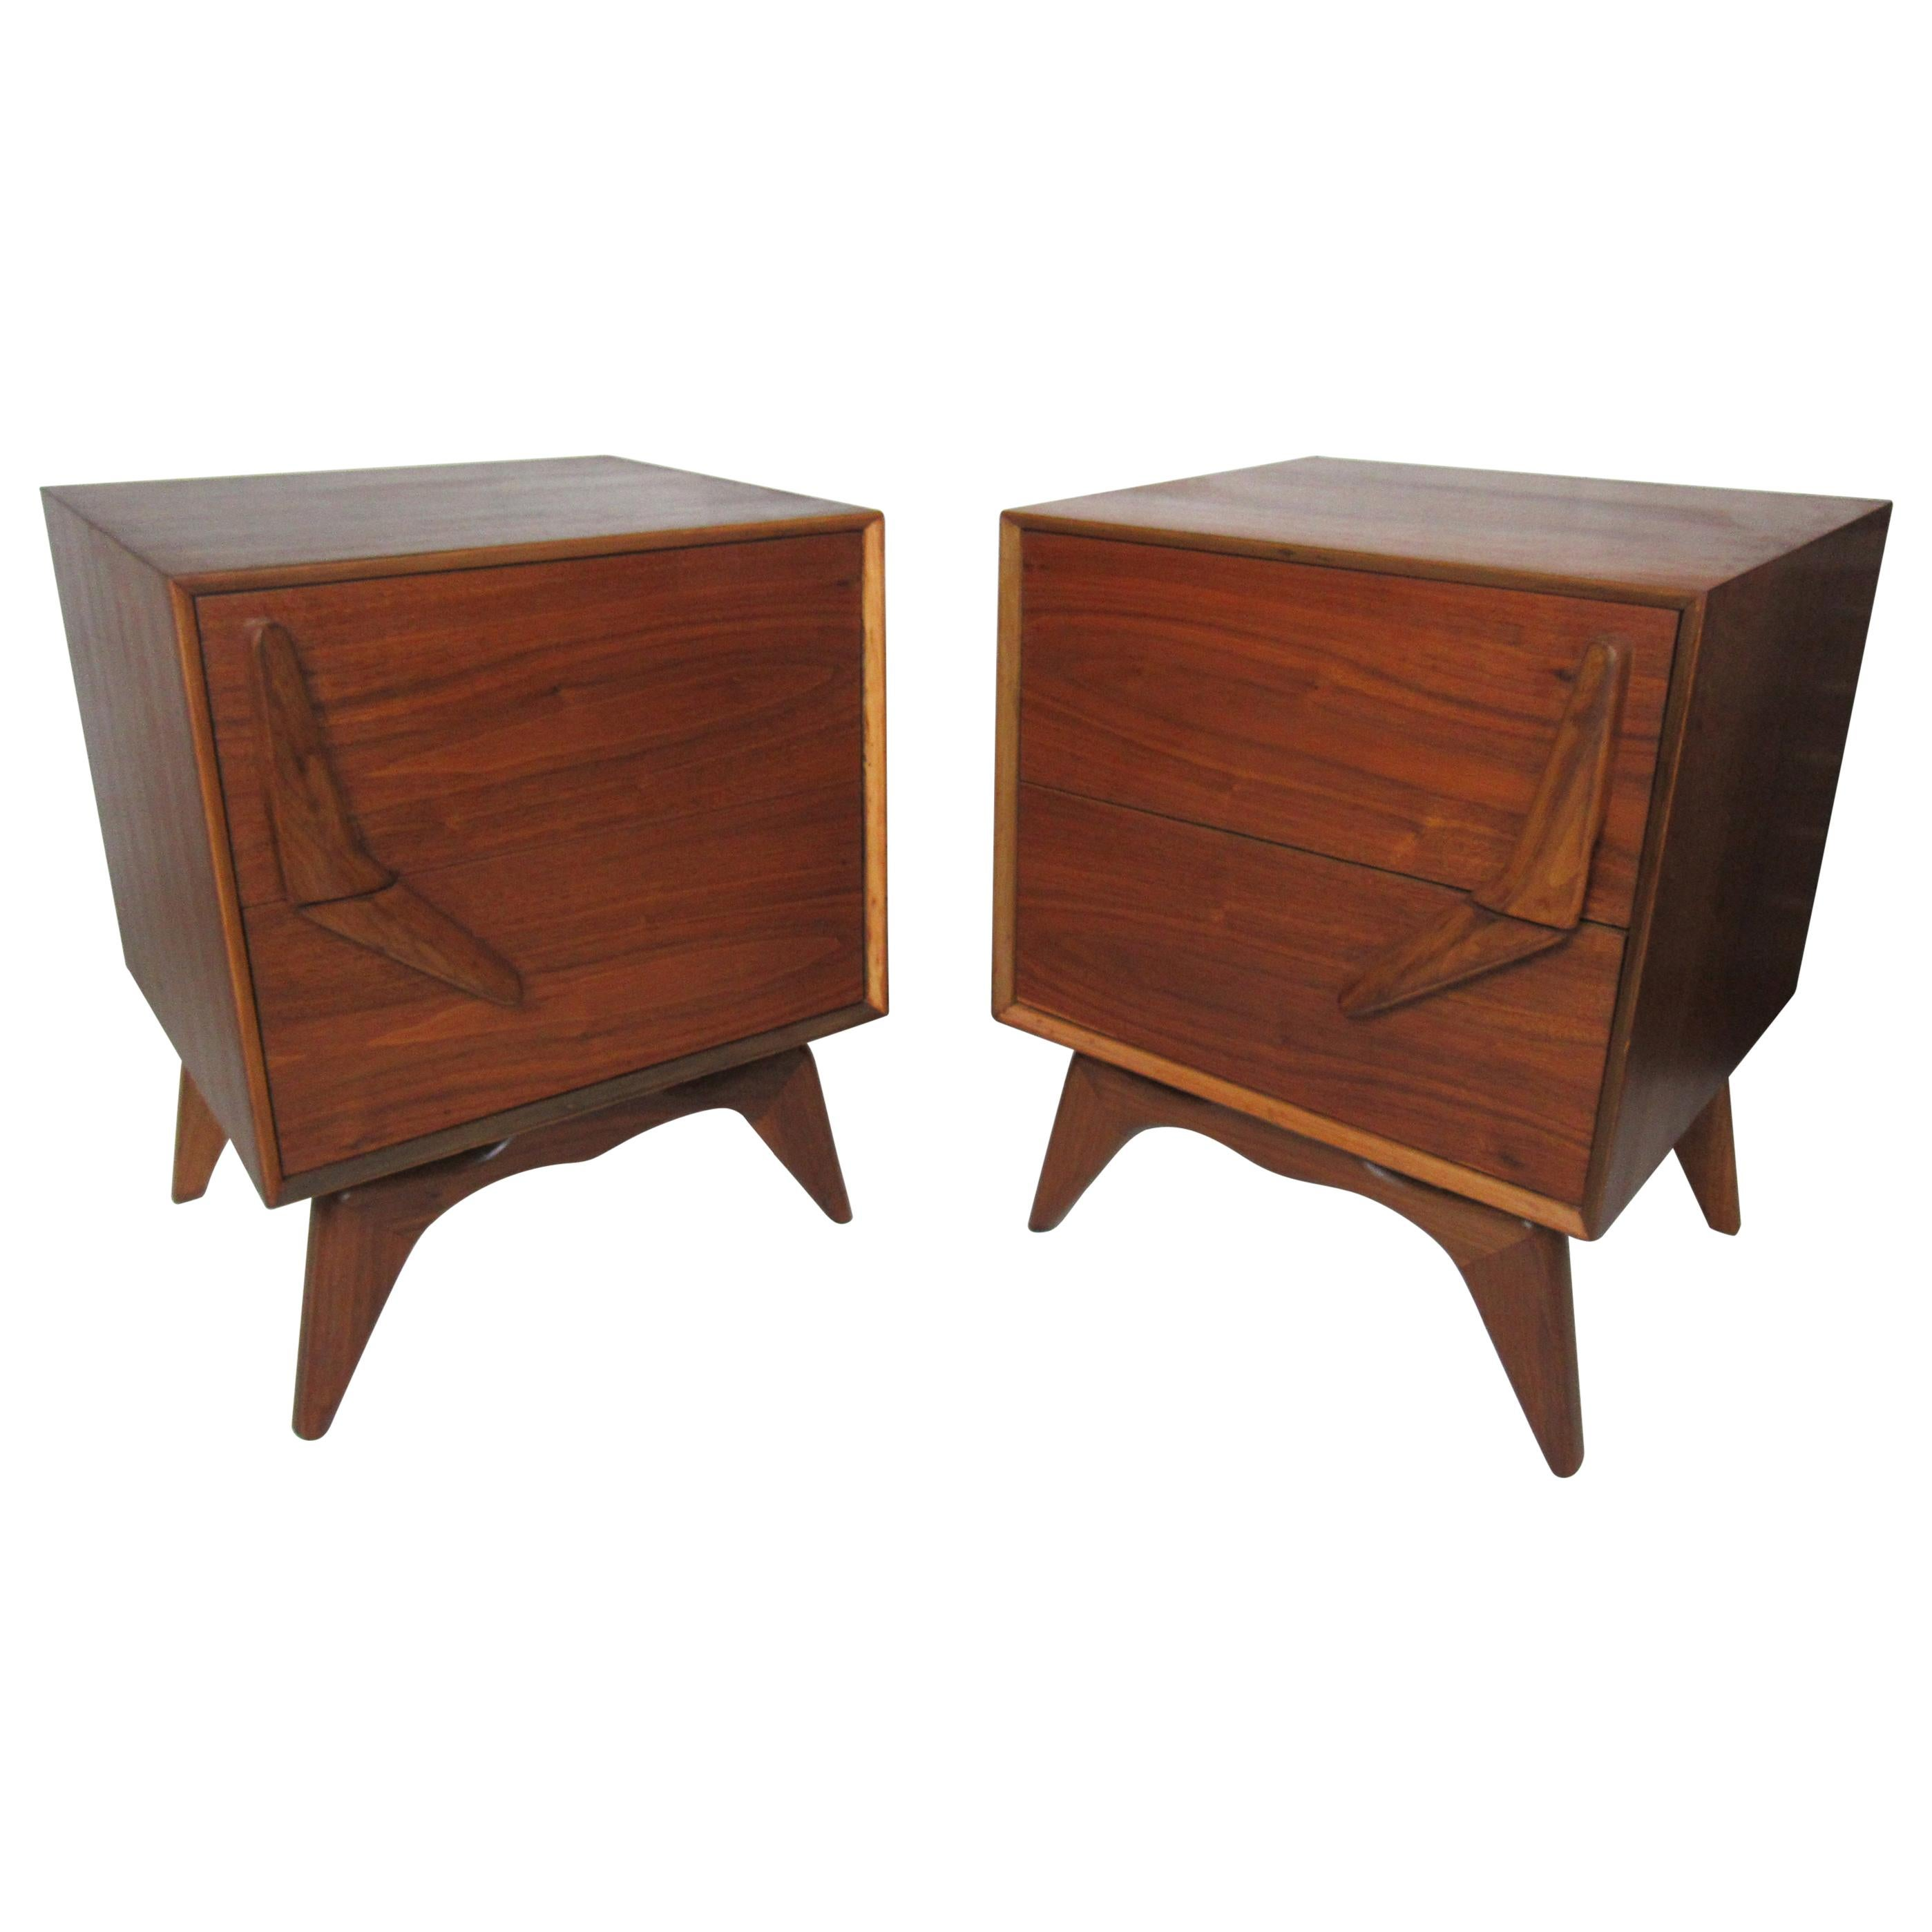 Pair of Mid-Century Modern Nightstands